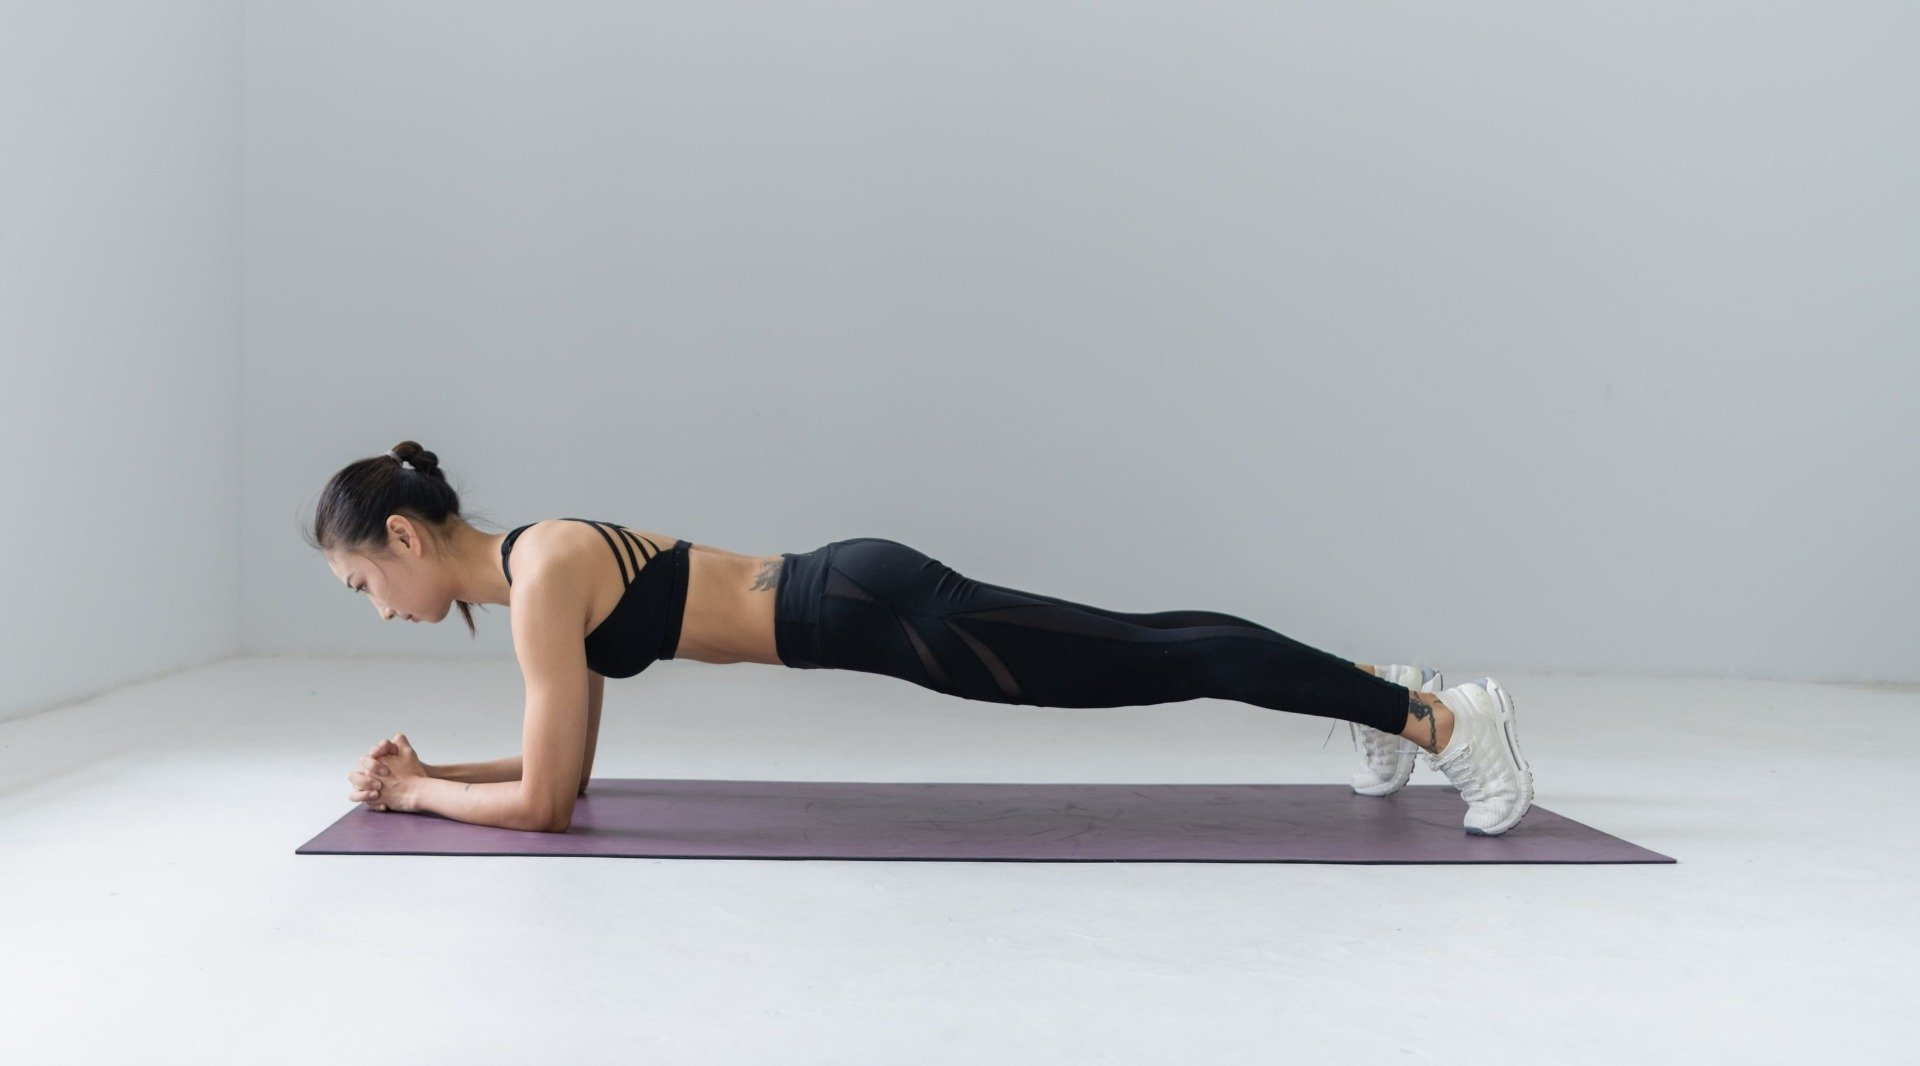 Exerciții pentru abdomen - plank